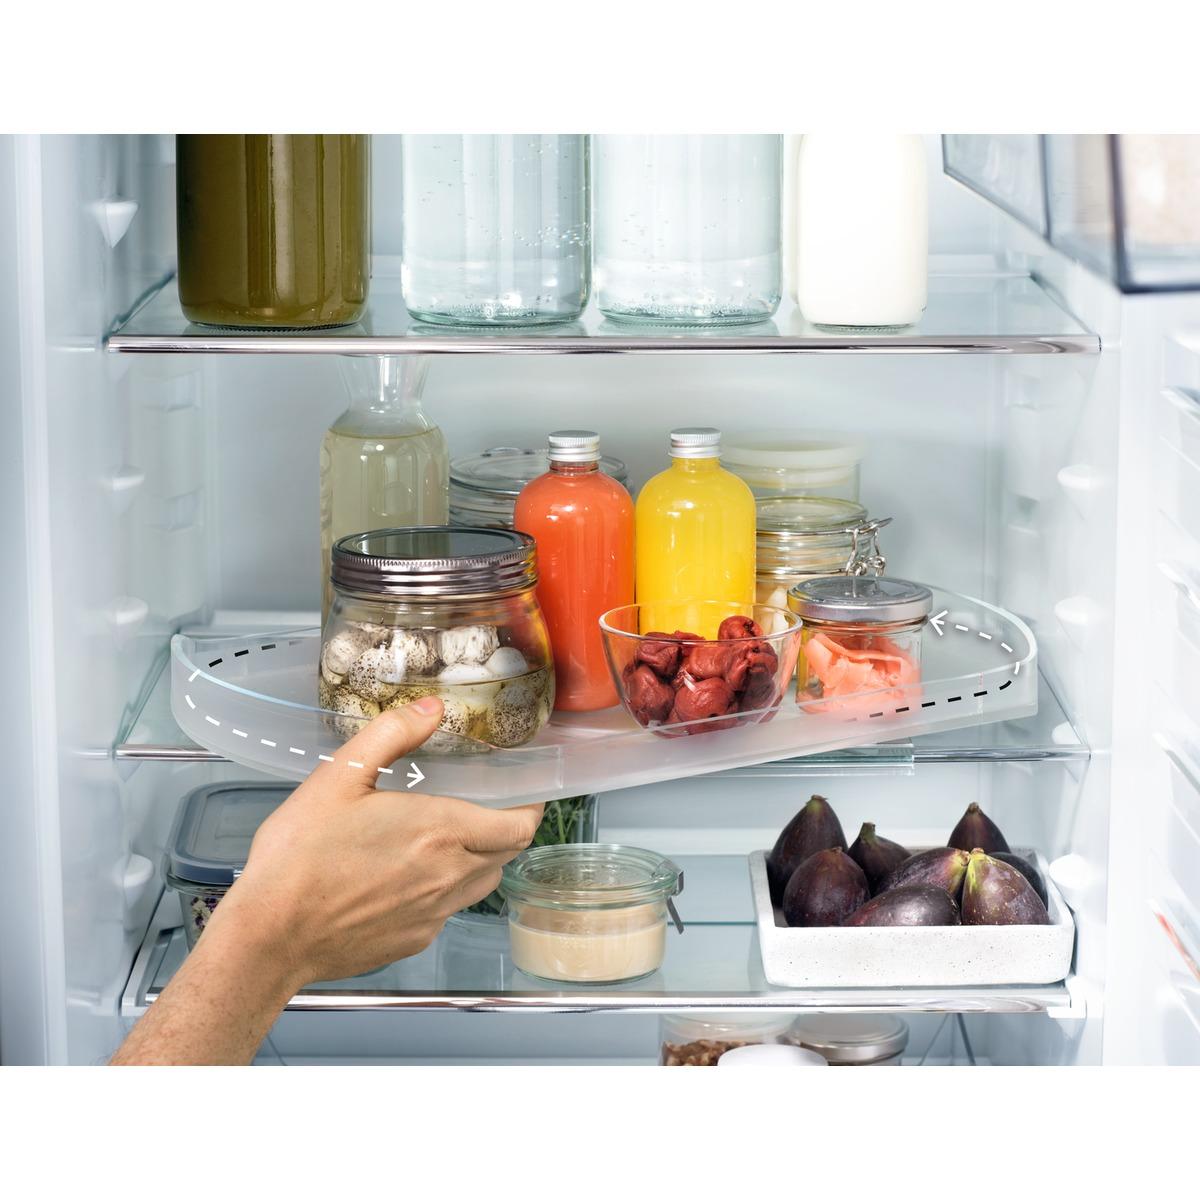 AEG A6RHSW31 koelkast accessoire